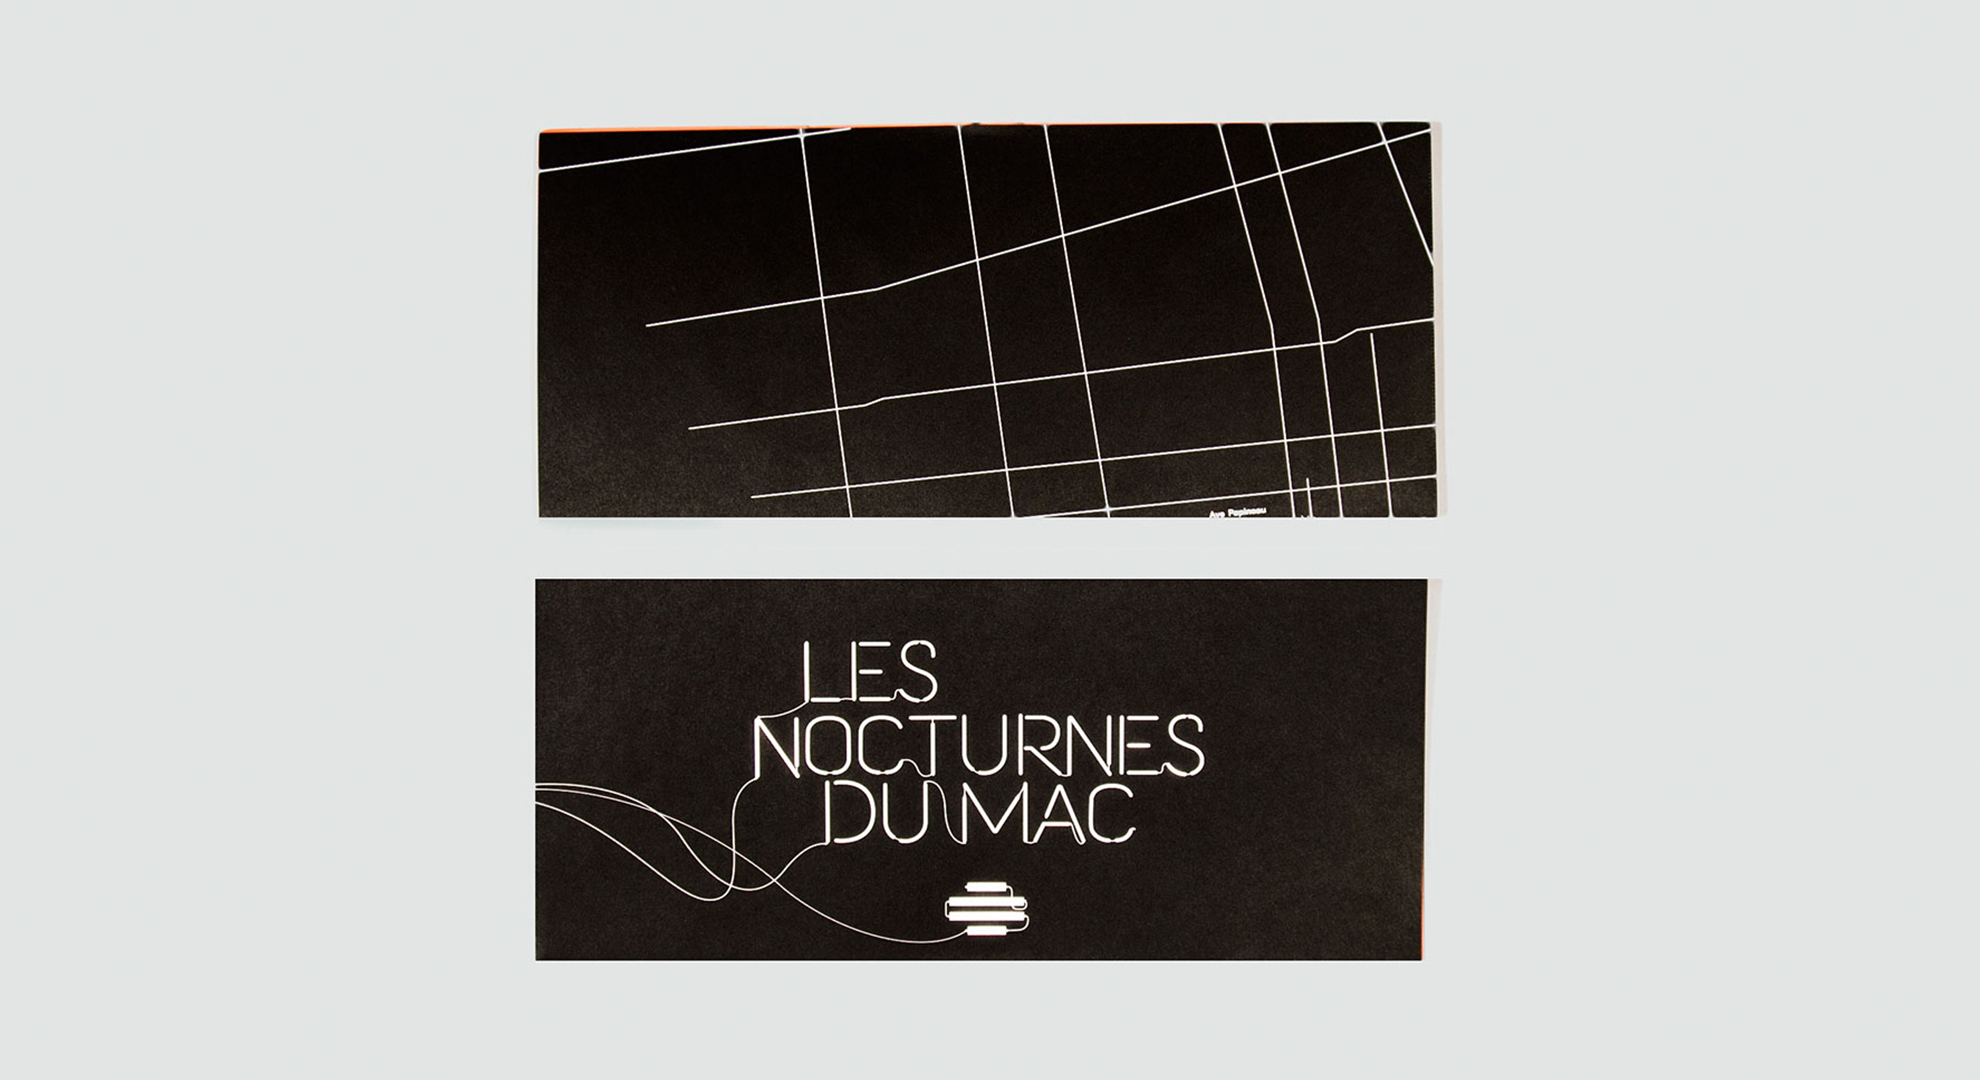 alix+neyvoz+nocturnes+musée+art+contemporain+neon+design+party+8.jpg